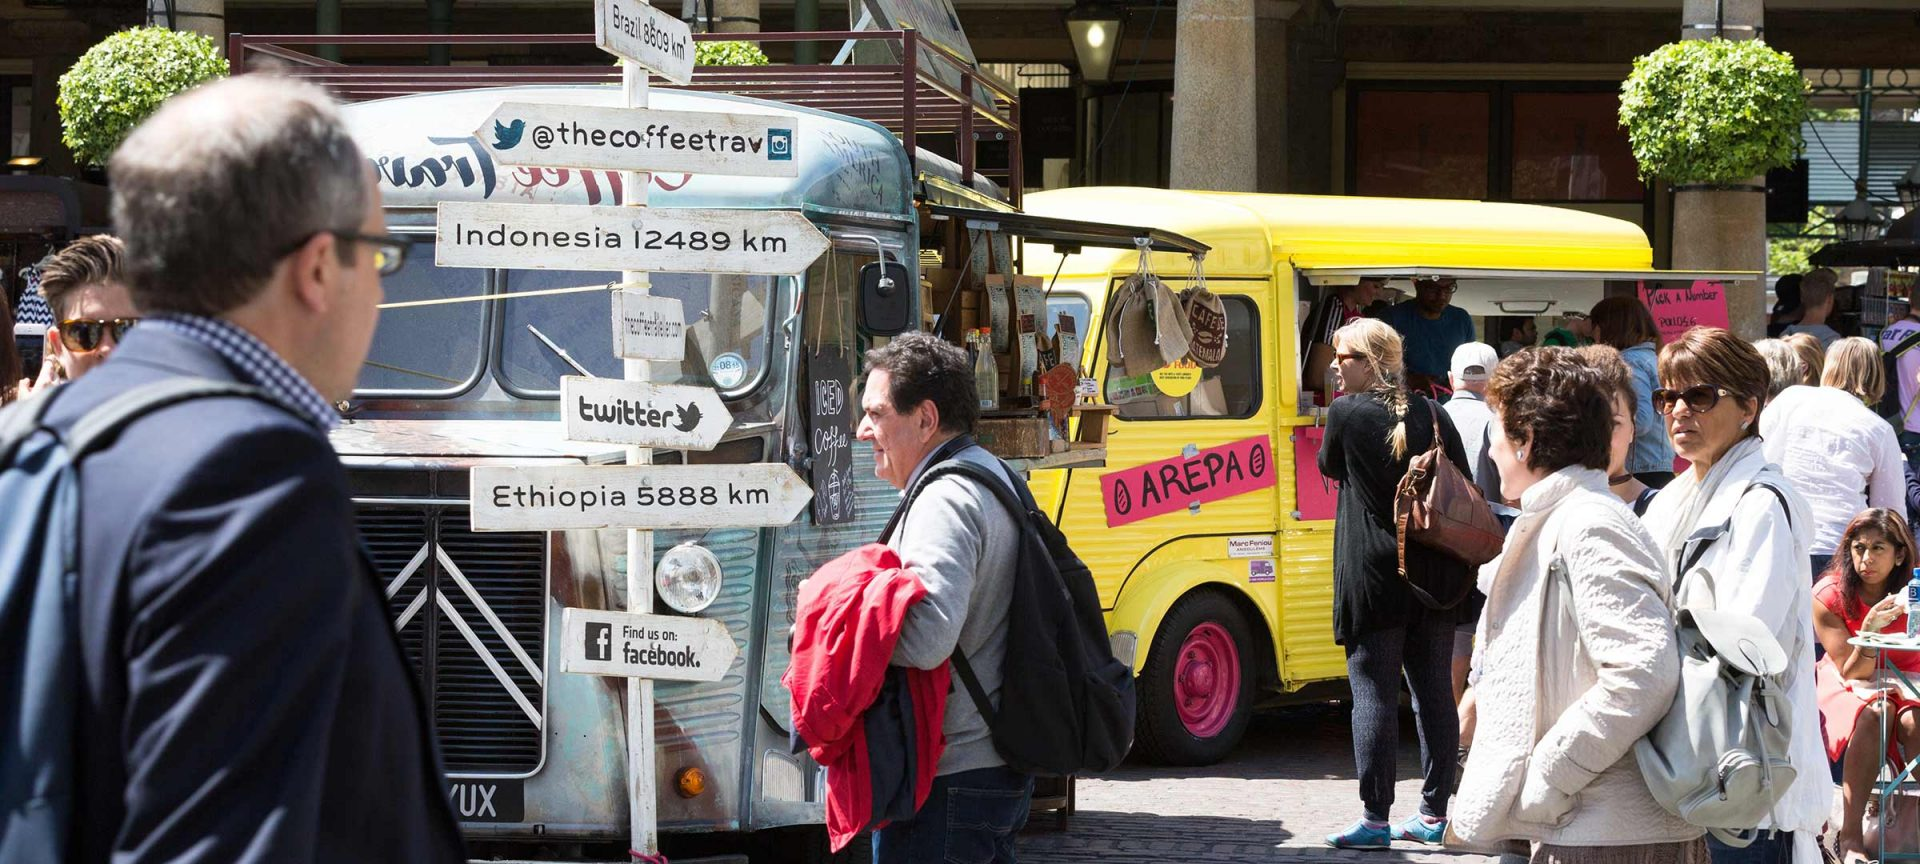 StreetDot-vendor-types